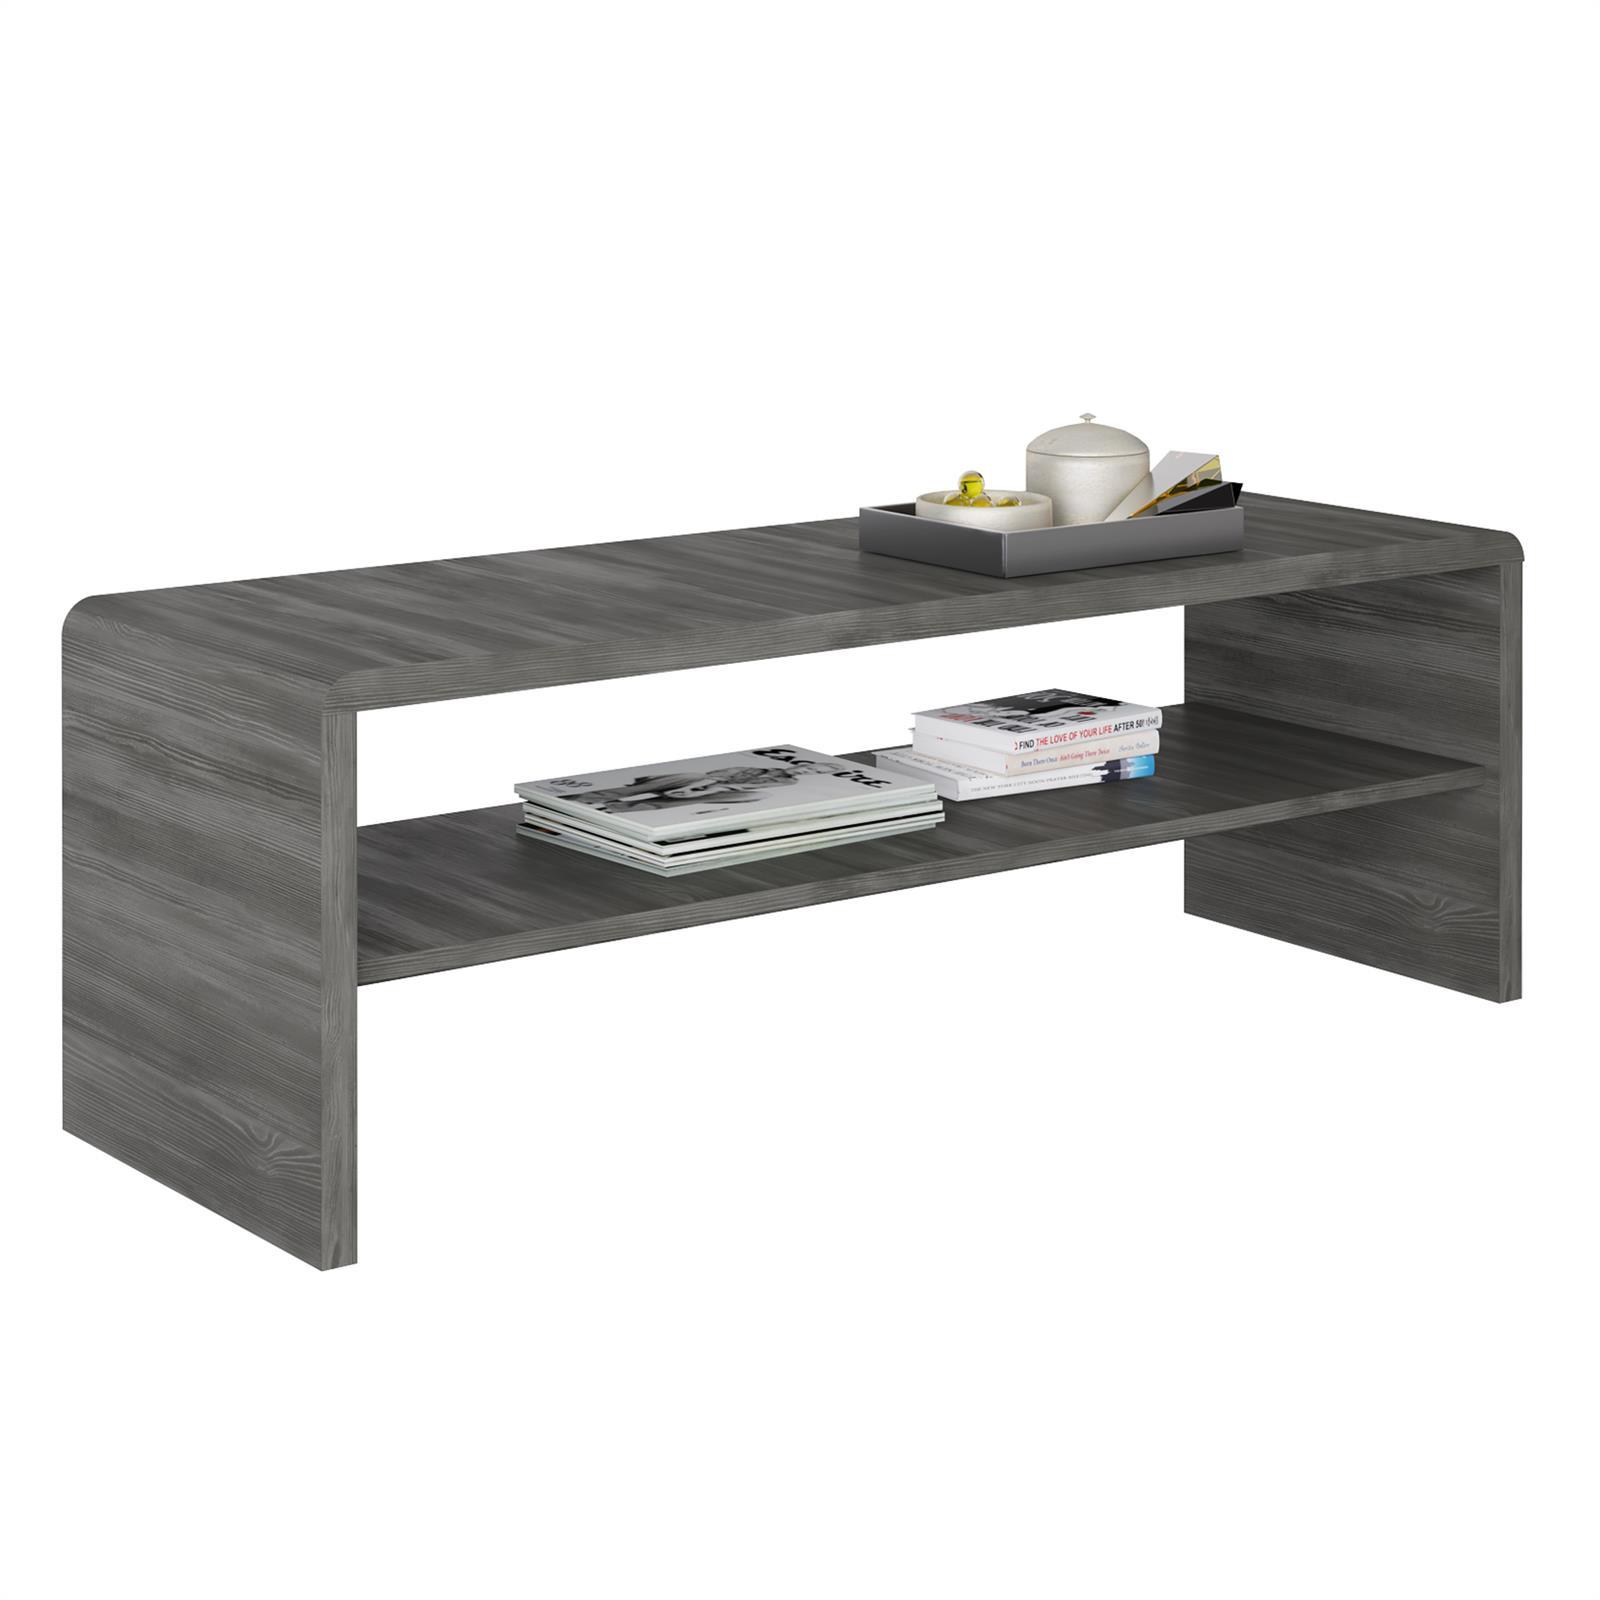 meuble tv table basse louna d cor gris cendr mobil meubles. Black Bedroom Furniture Sets. Home Design Ideas